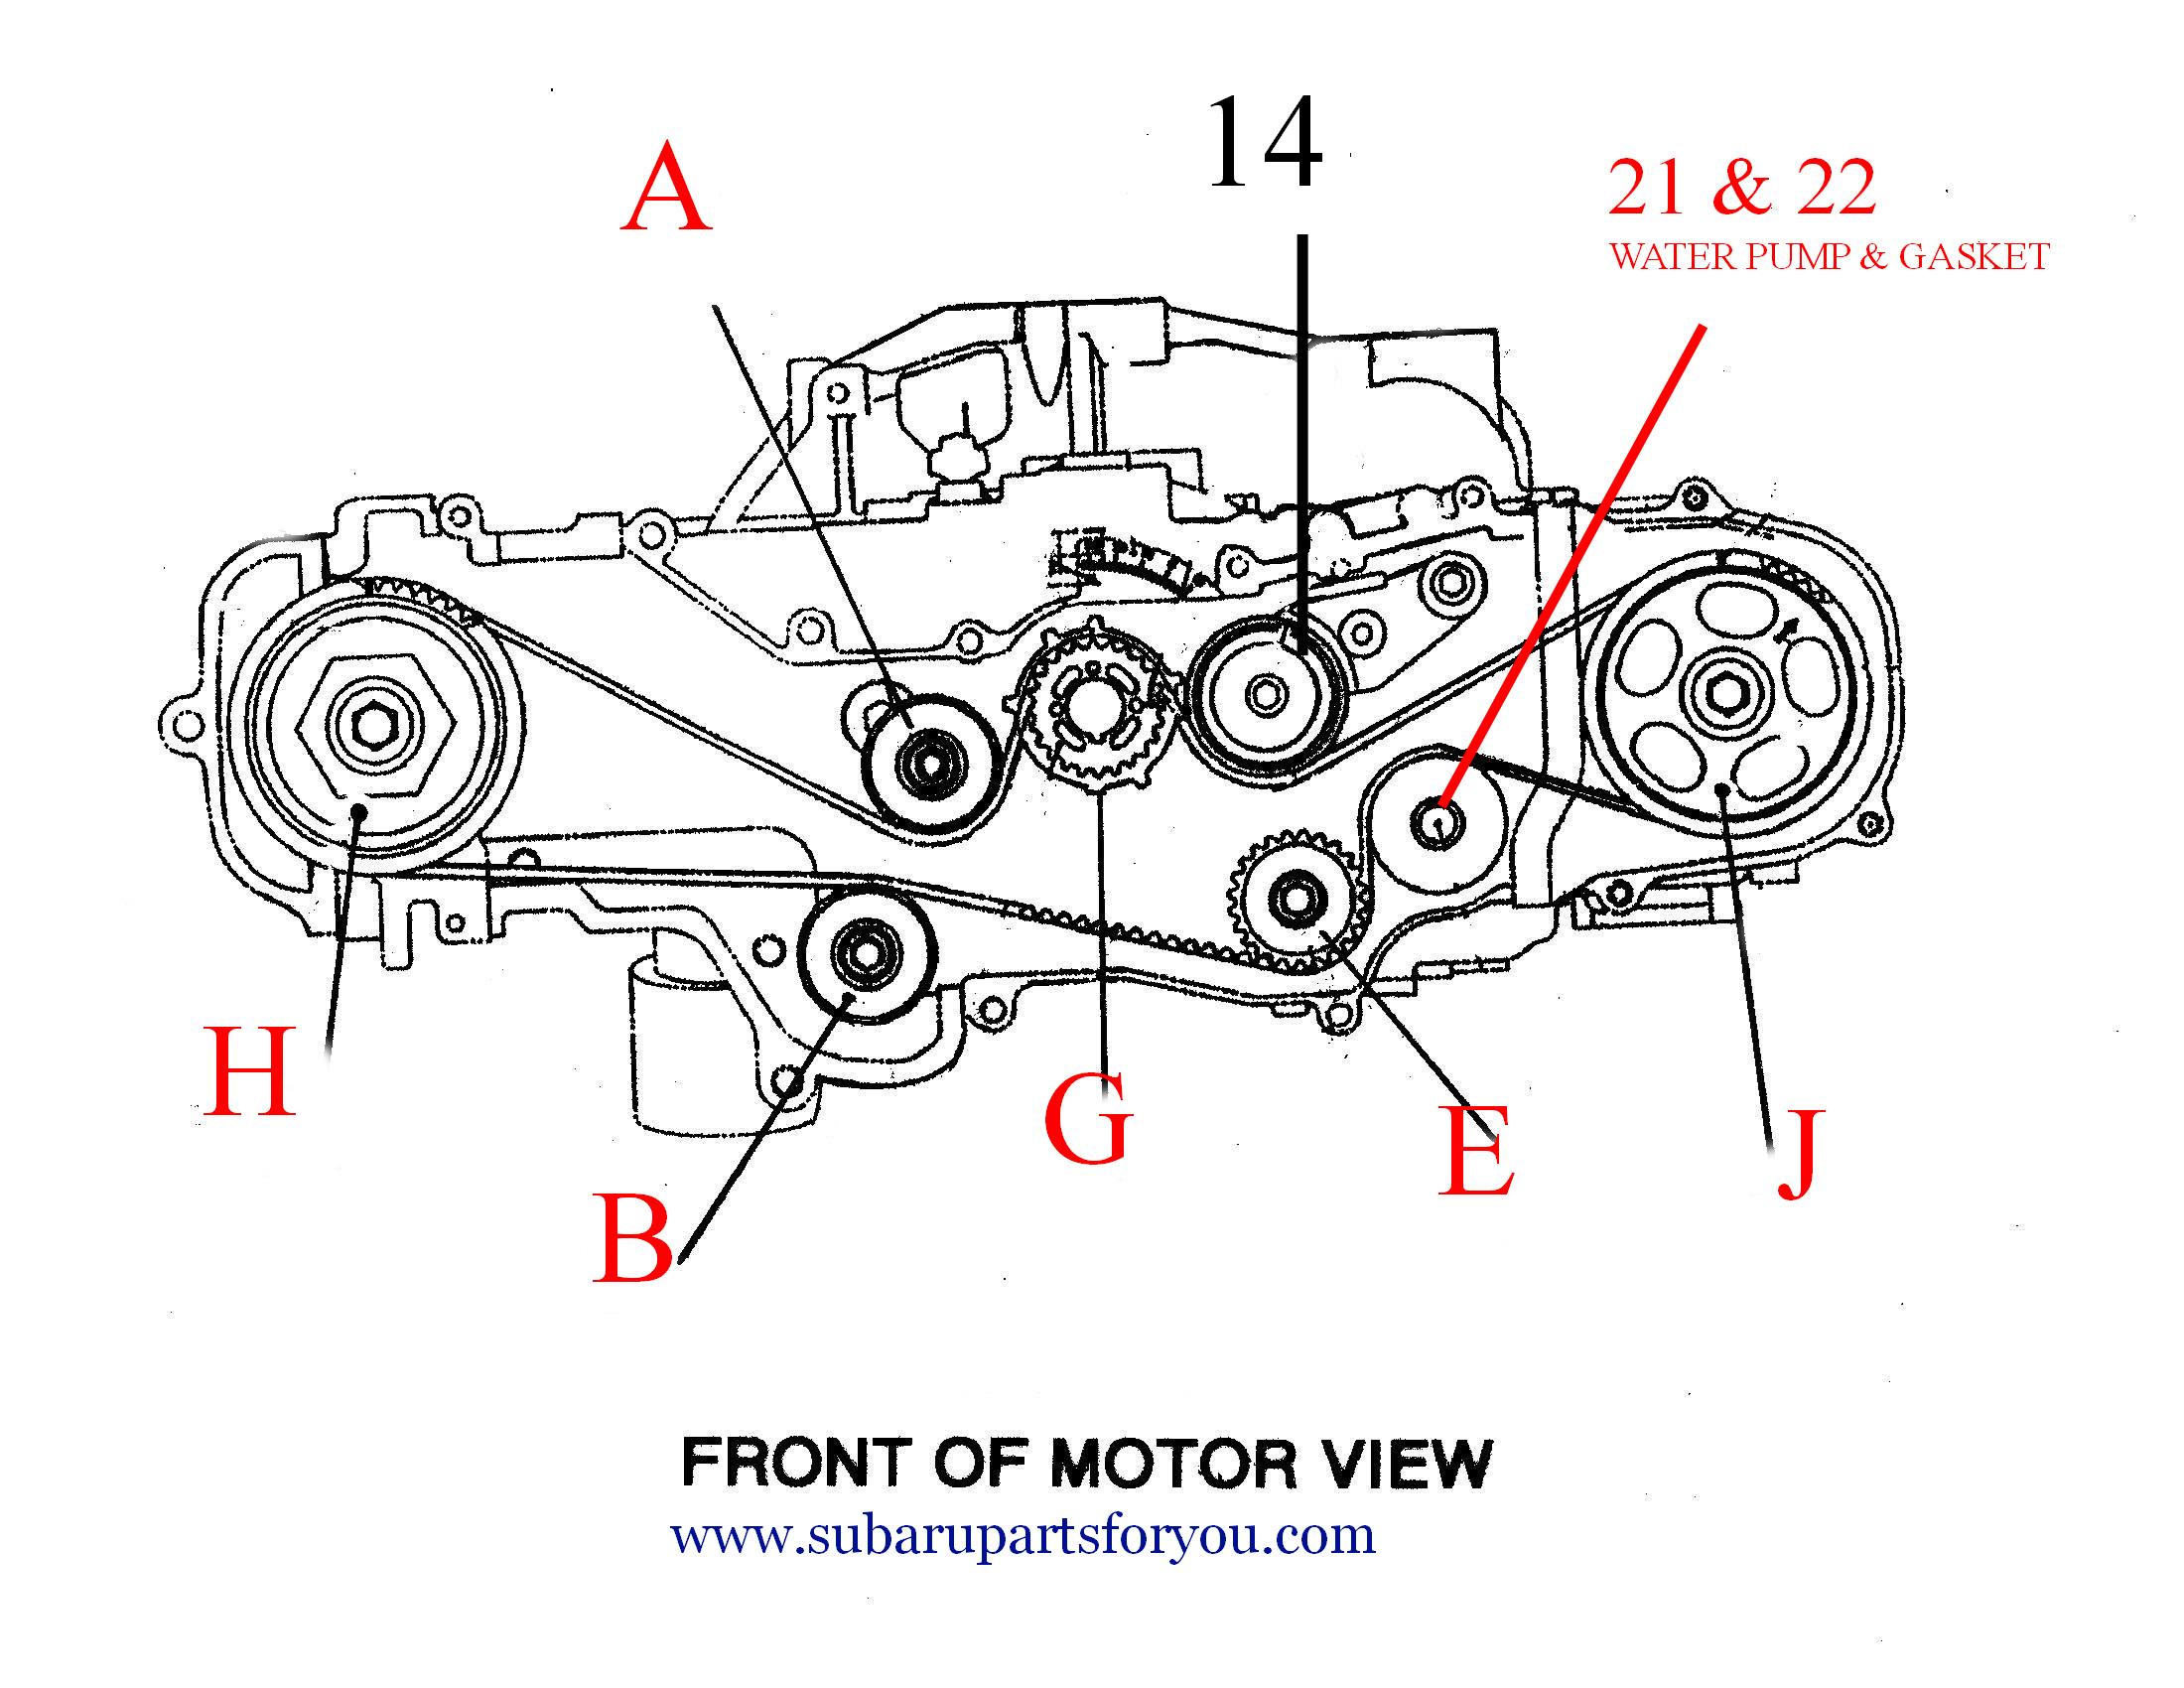 2005 Subaru Outback Repair Manualsubaru Forester Manual 1998 Crank Will Only Turn 90 Deg On My 2 5